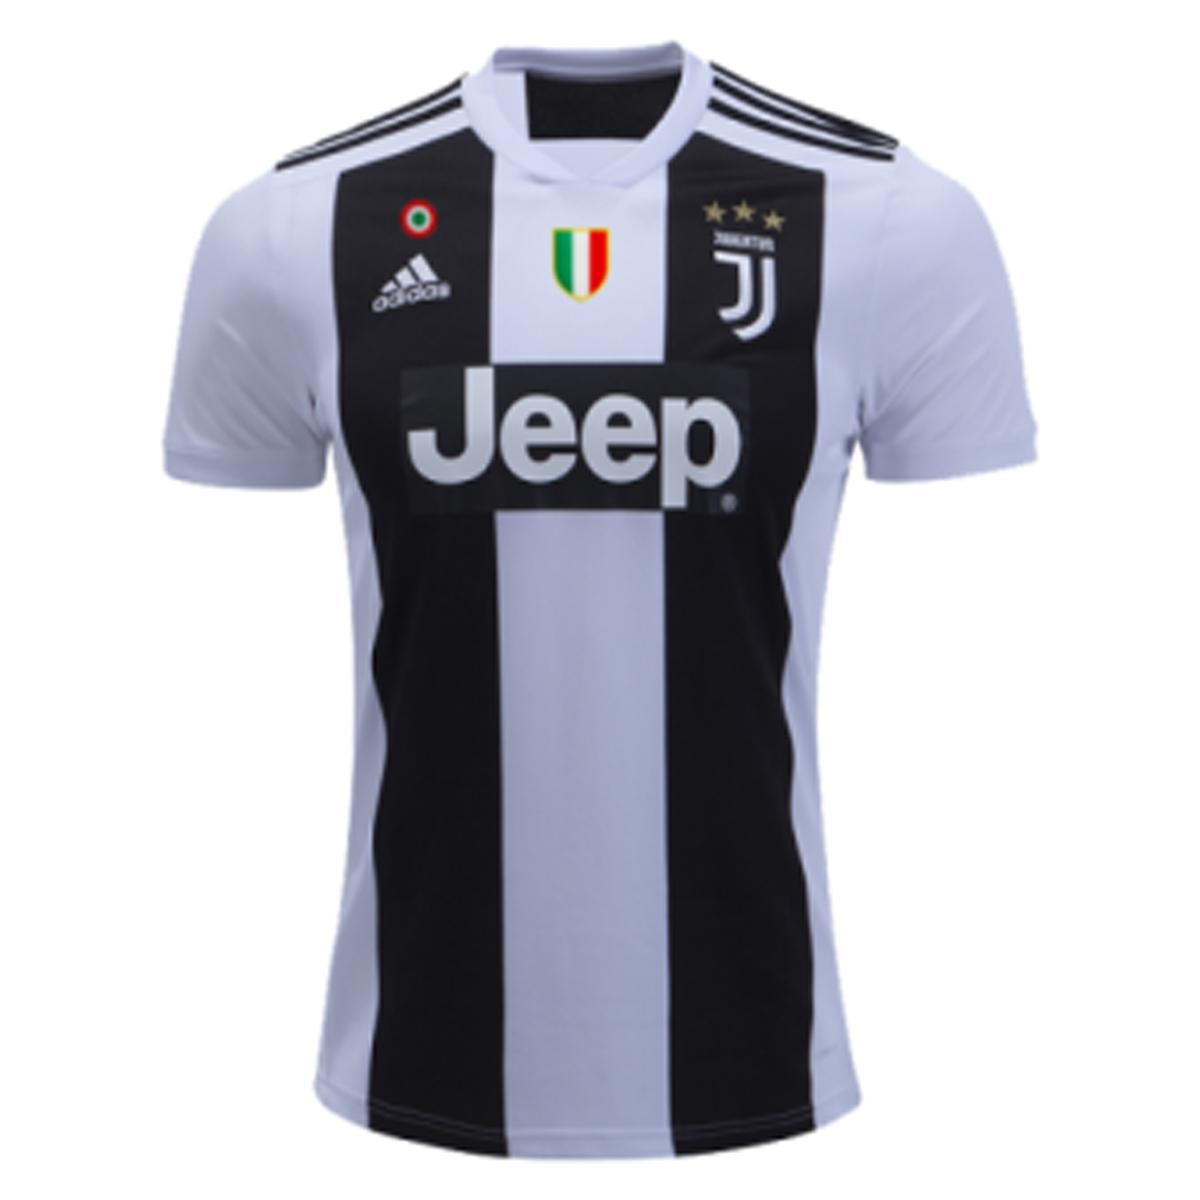 d1d0569c3c37 Jersey Price In Bangladesh - Buy Football Jerseys From Daraz.com.bd